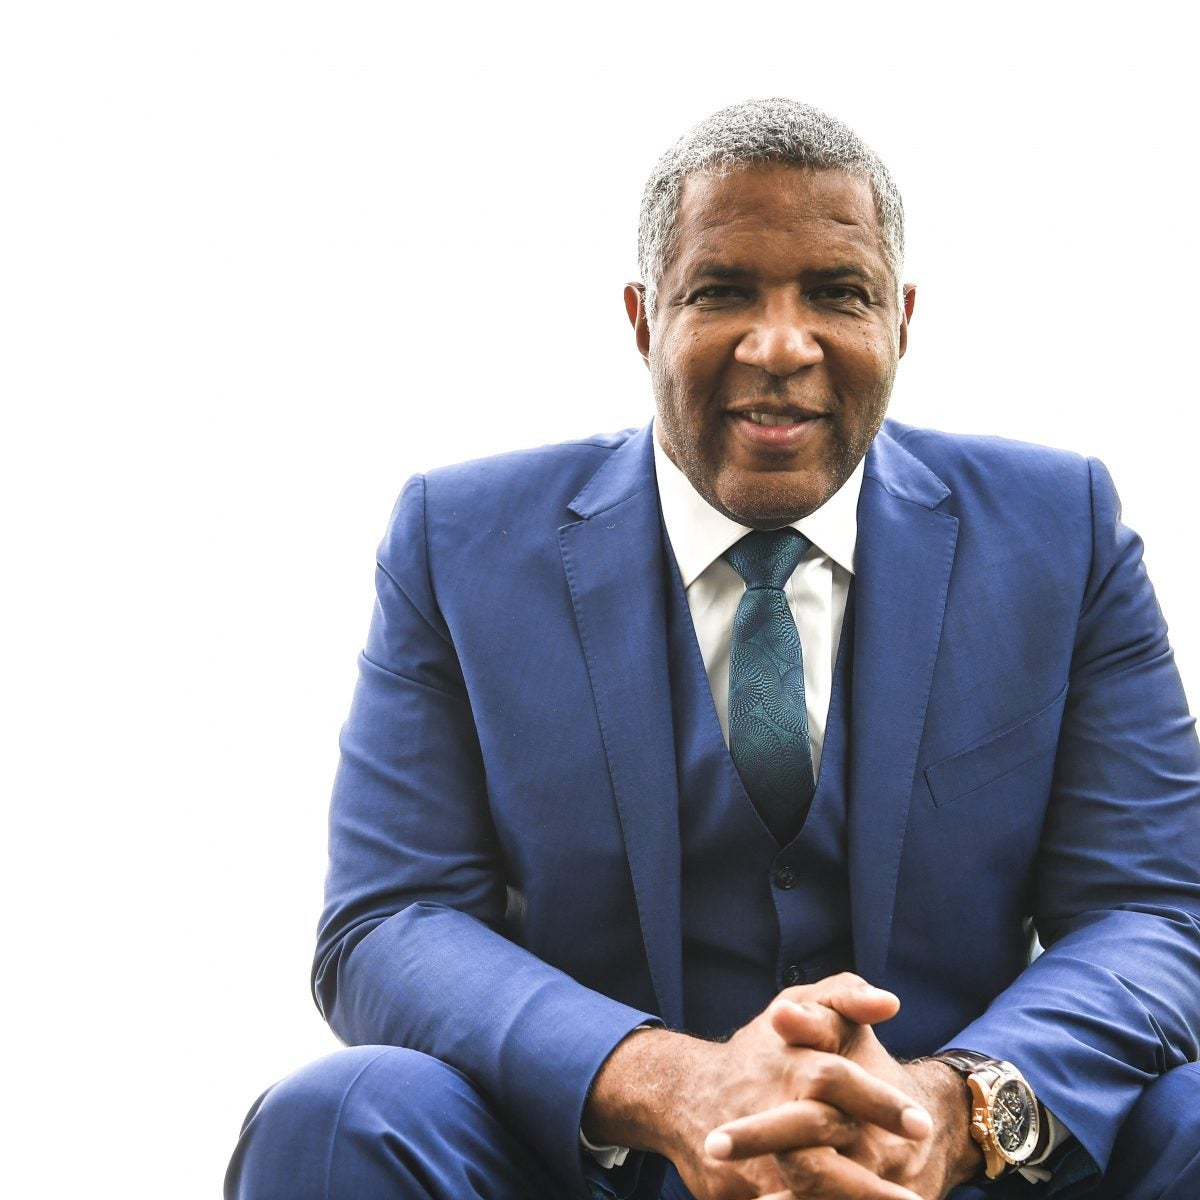 Black Billionaire Robert F. Smith To Speak At ESSENCE Entrepreneur + New Voices Virtual Summit This Friday